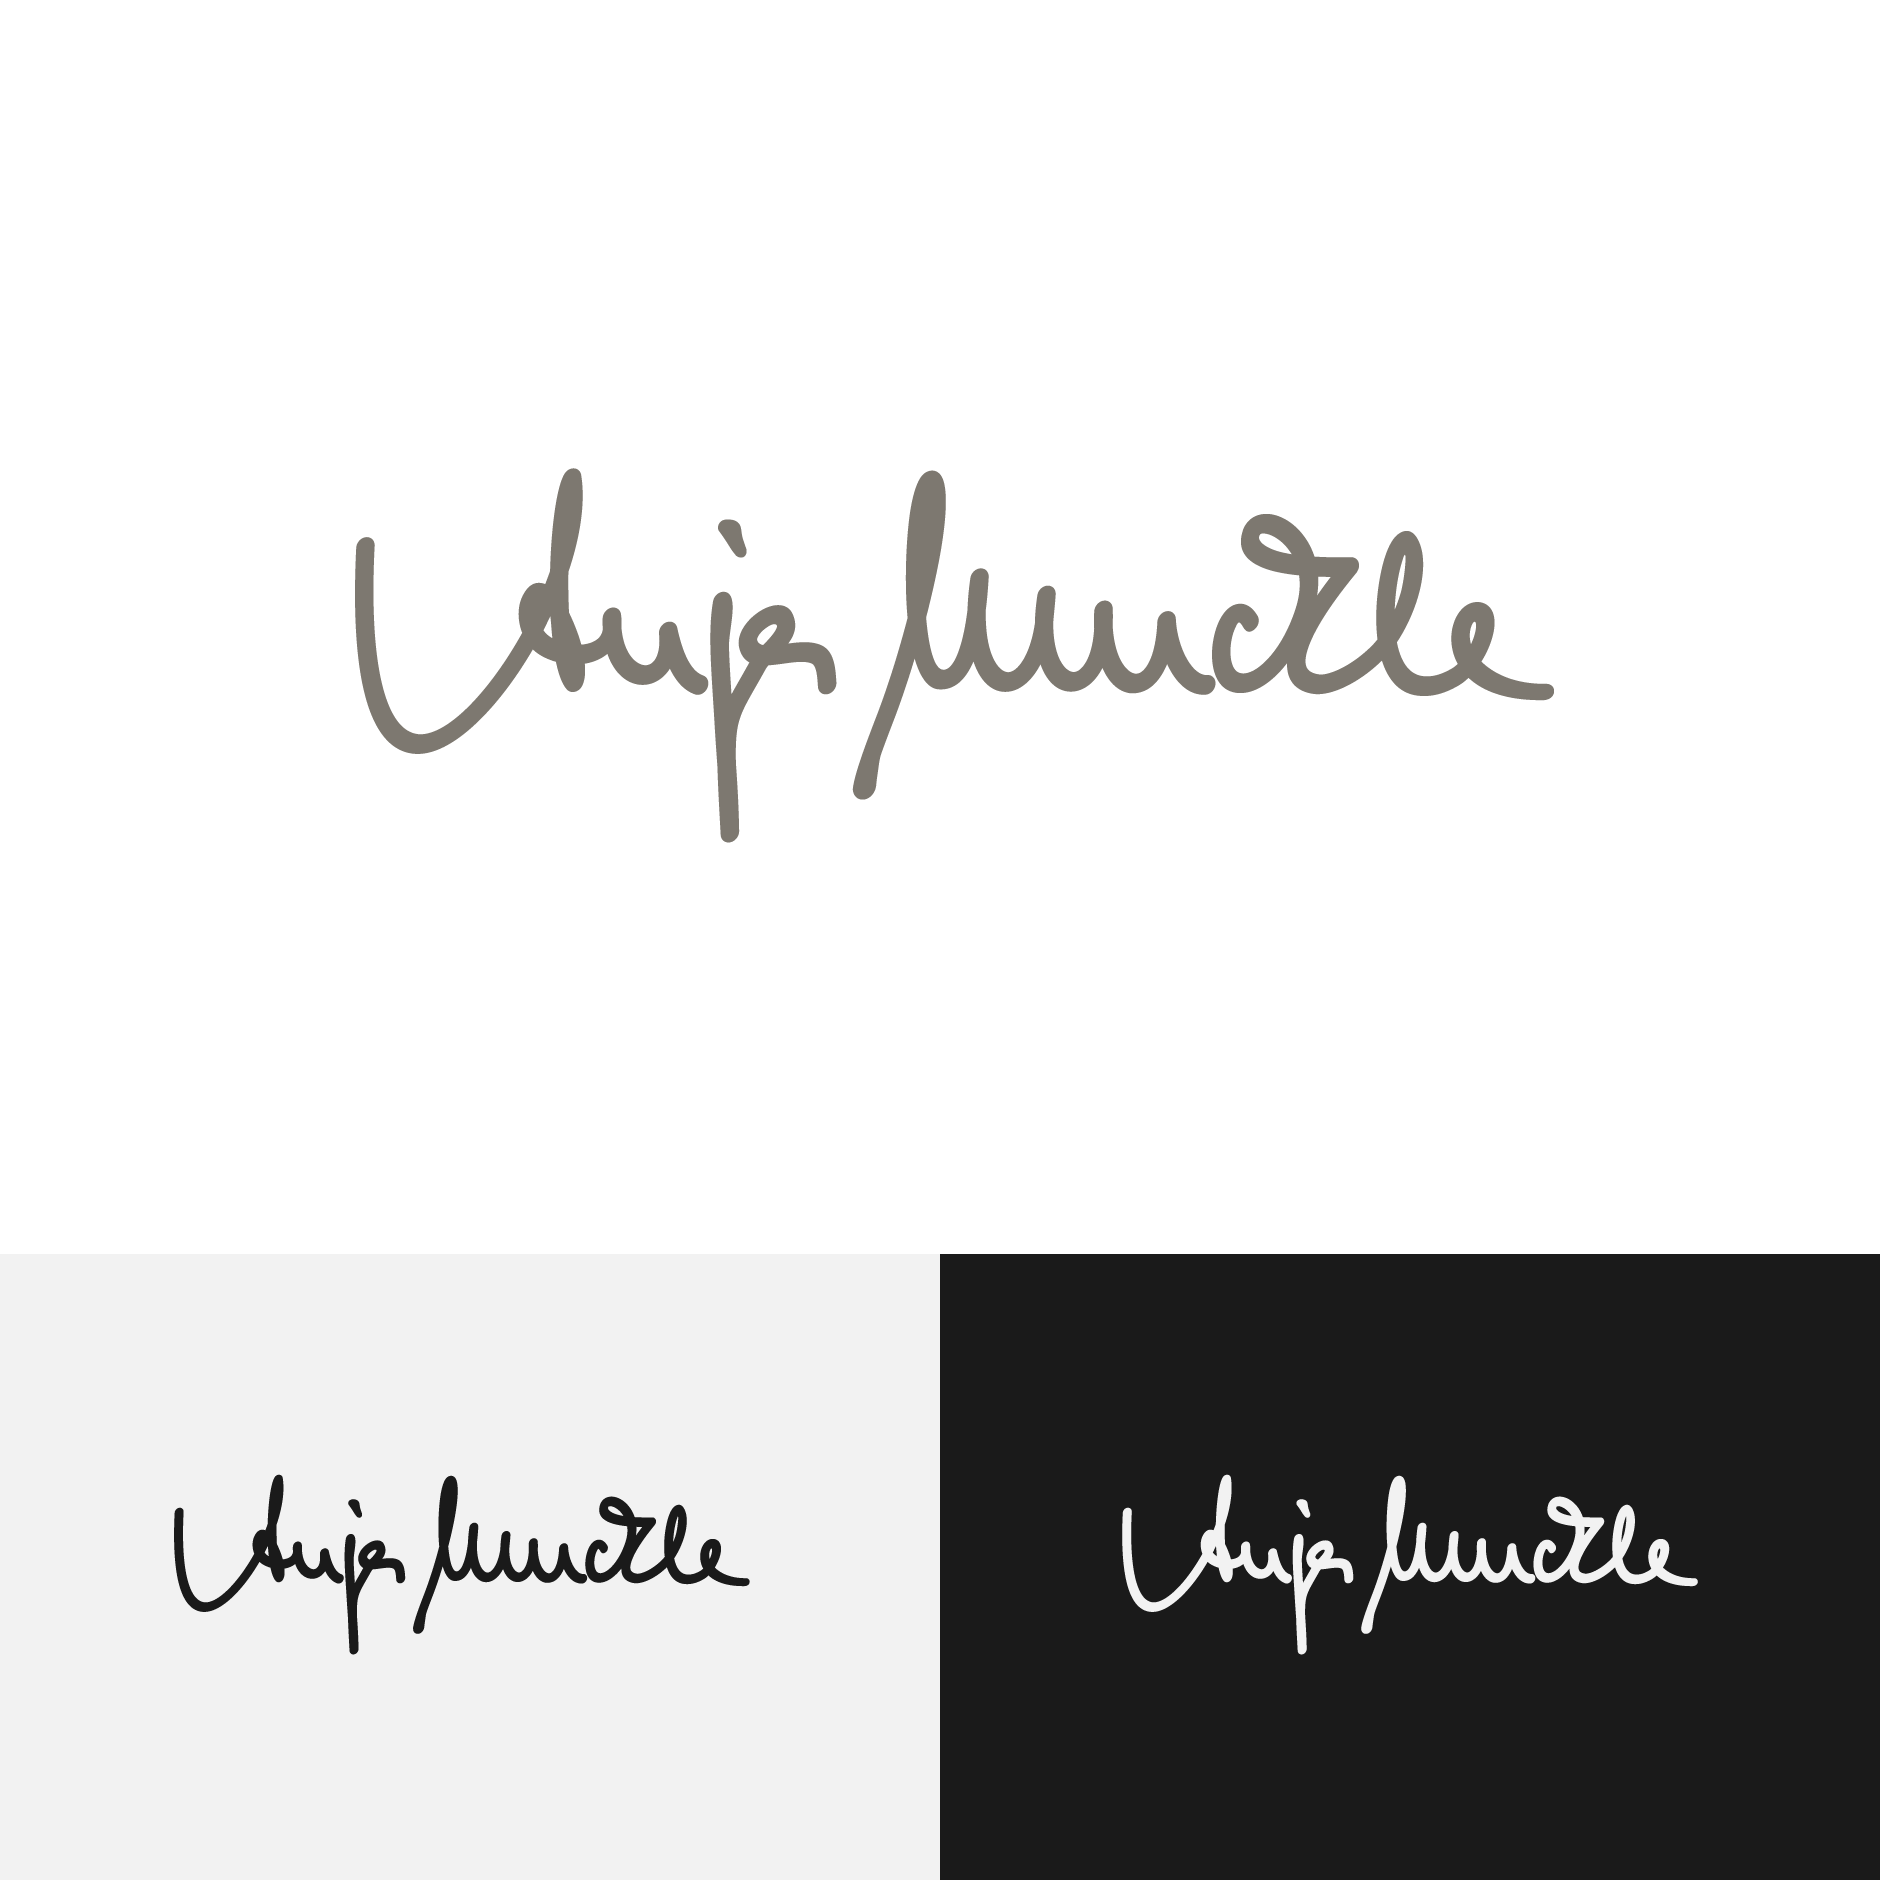 anja muckle sankt georgen logogestaltung-Logodesign Anja Muckle